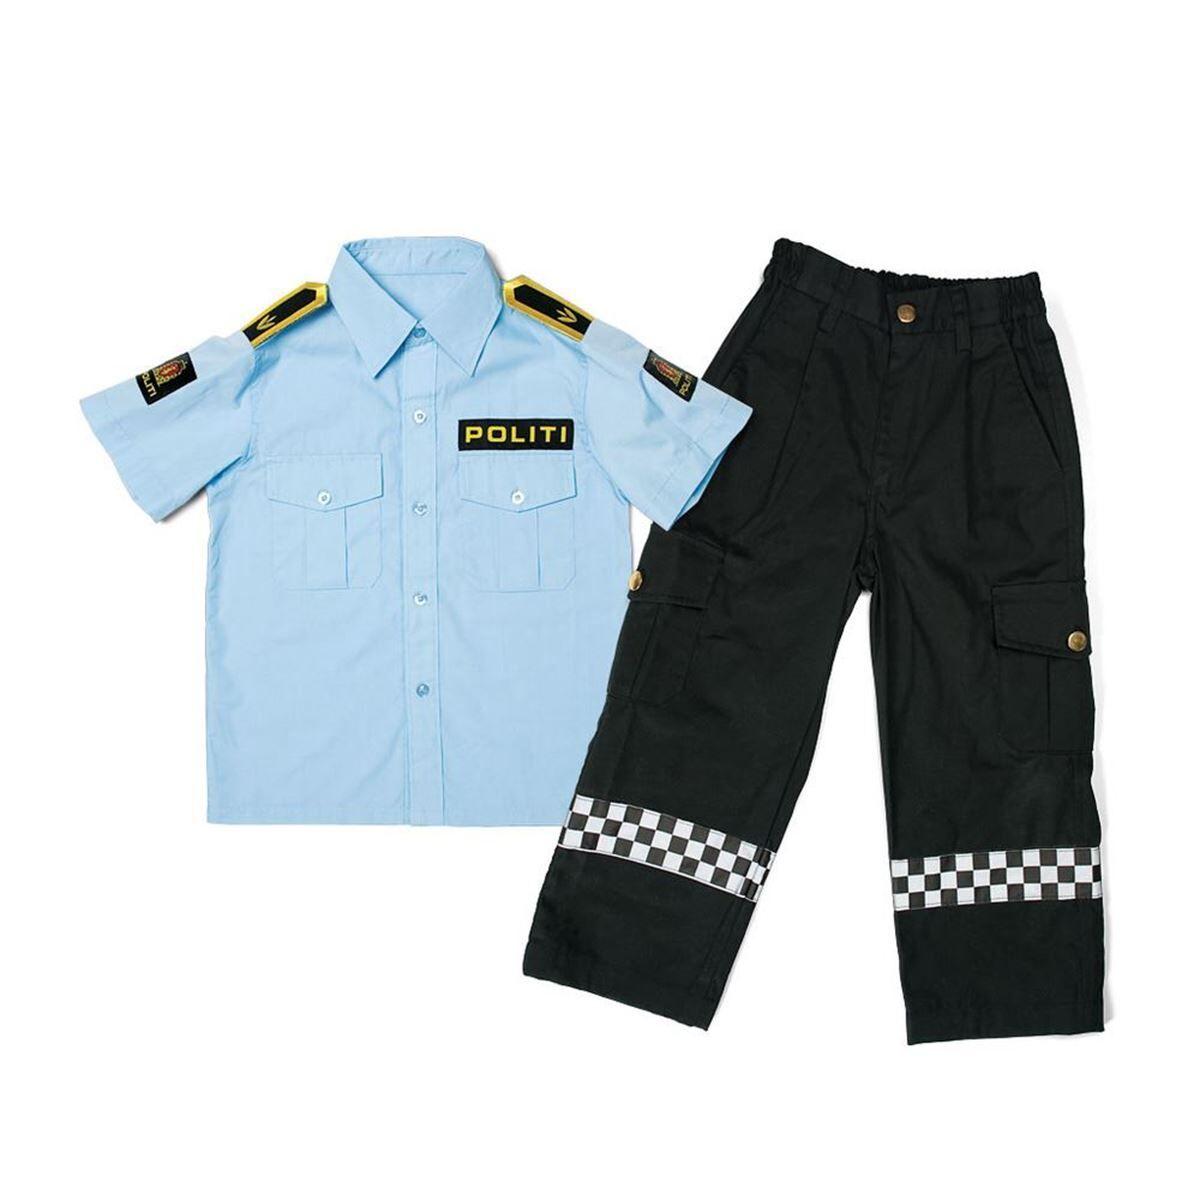 TSI Torsi Norsk Politiuniform, Skjorte + Bukse, 4-5 r